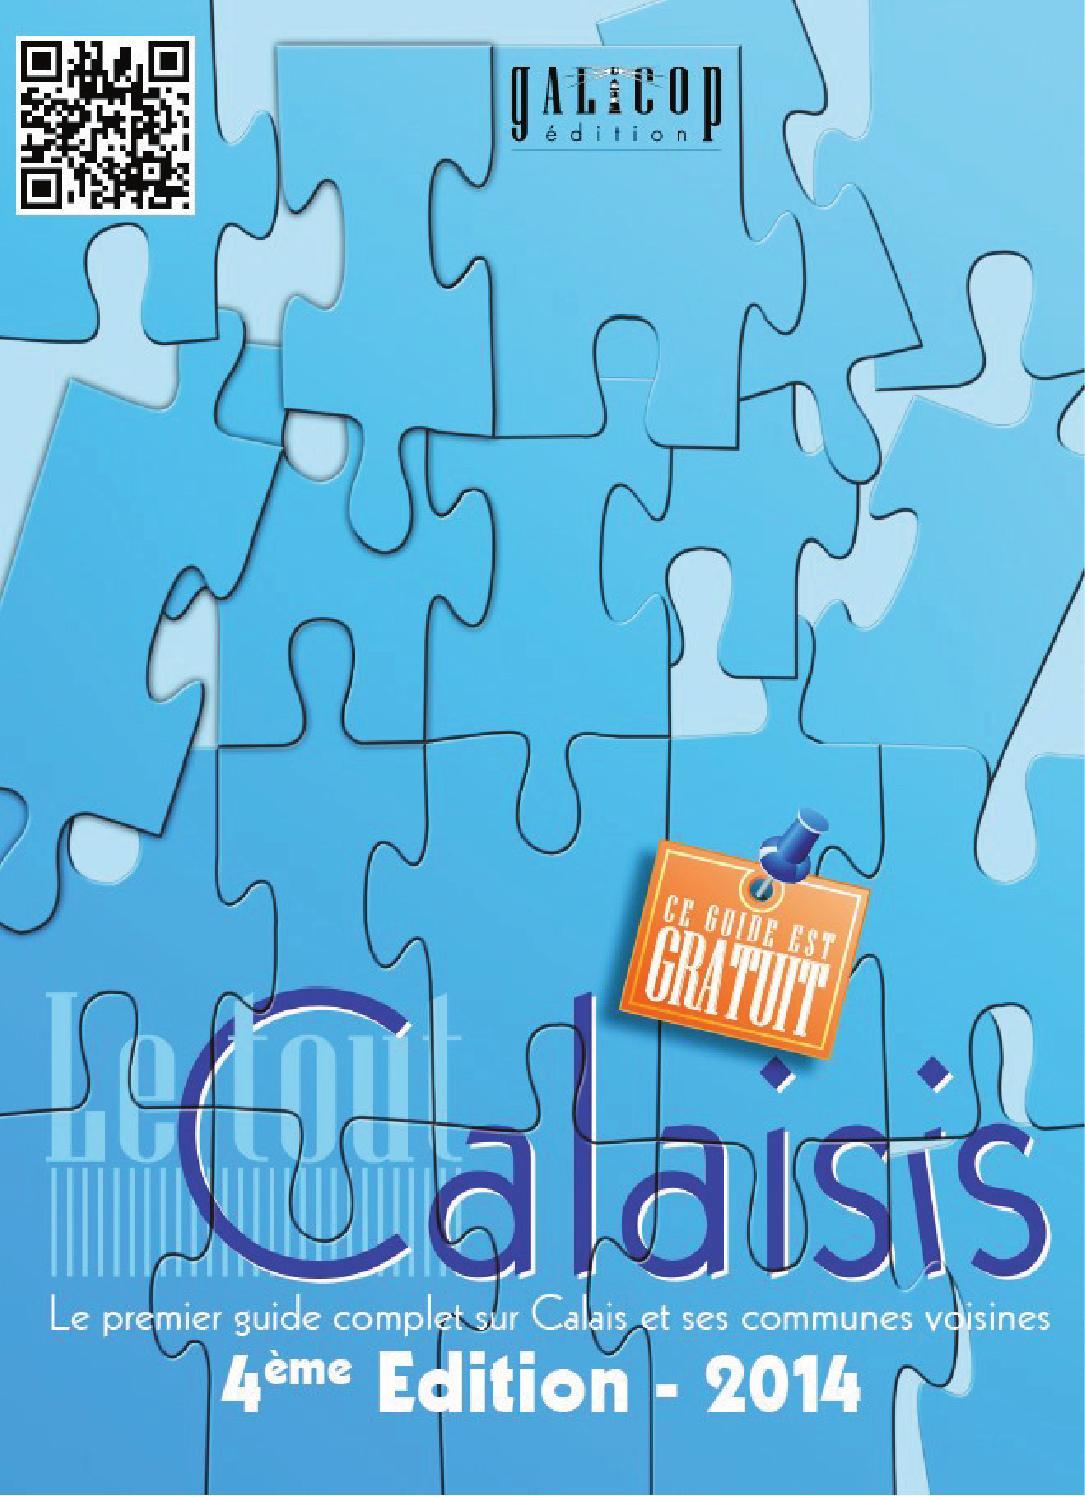 Letoutcalaisis 4eme Edition 2014 By Nathalie Vanhee Issuu